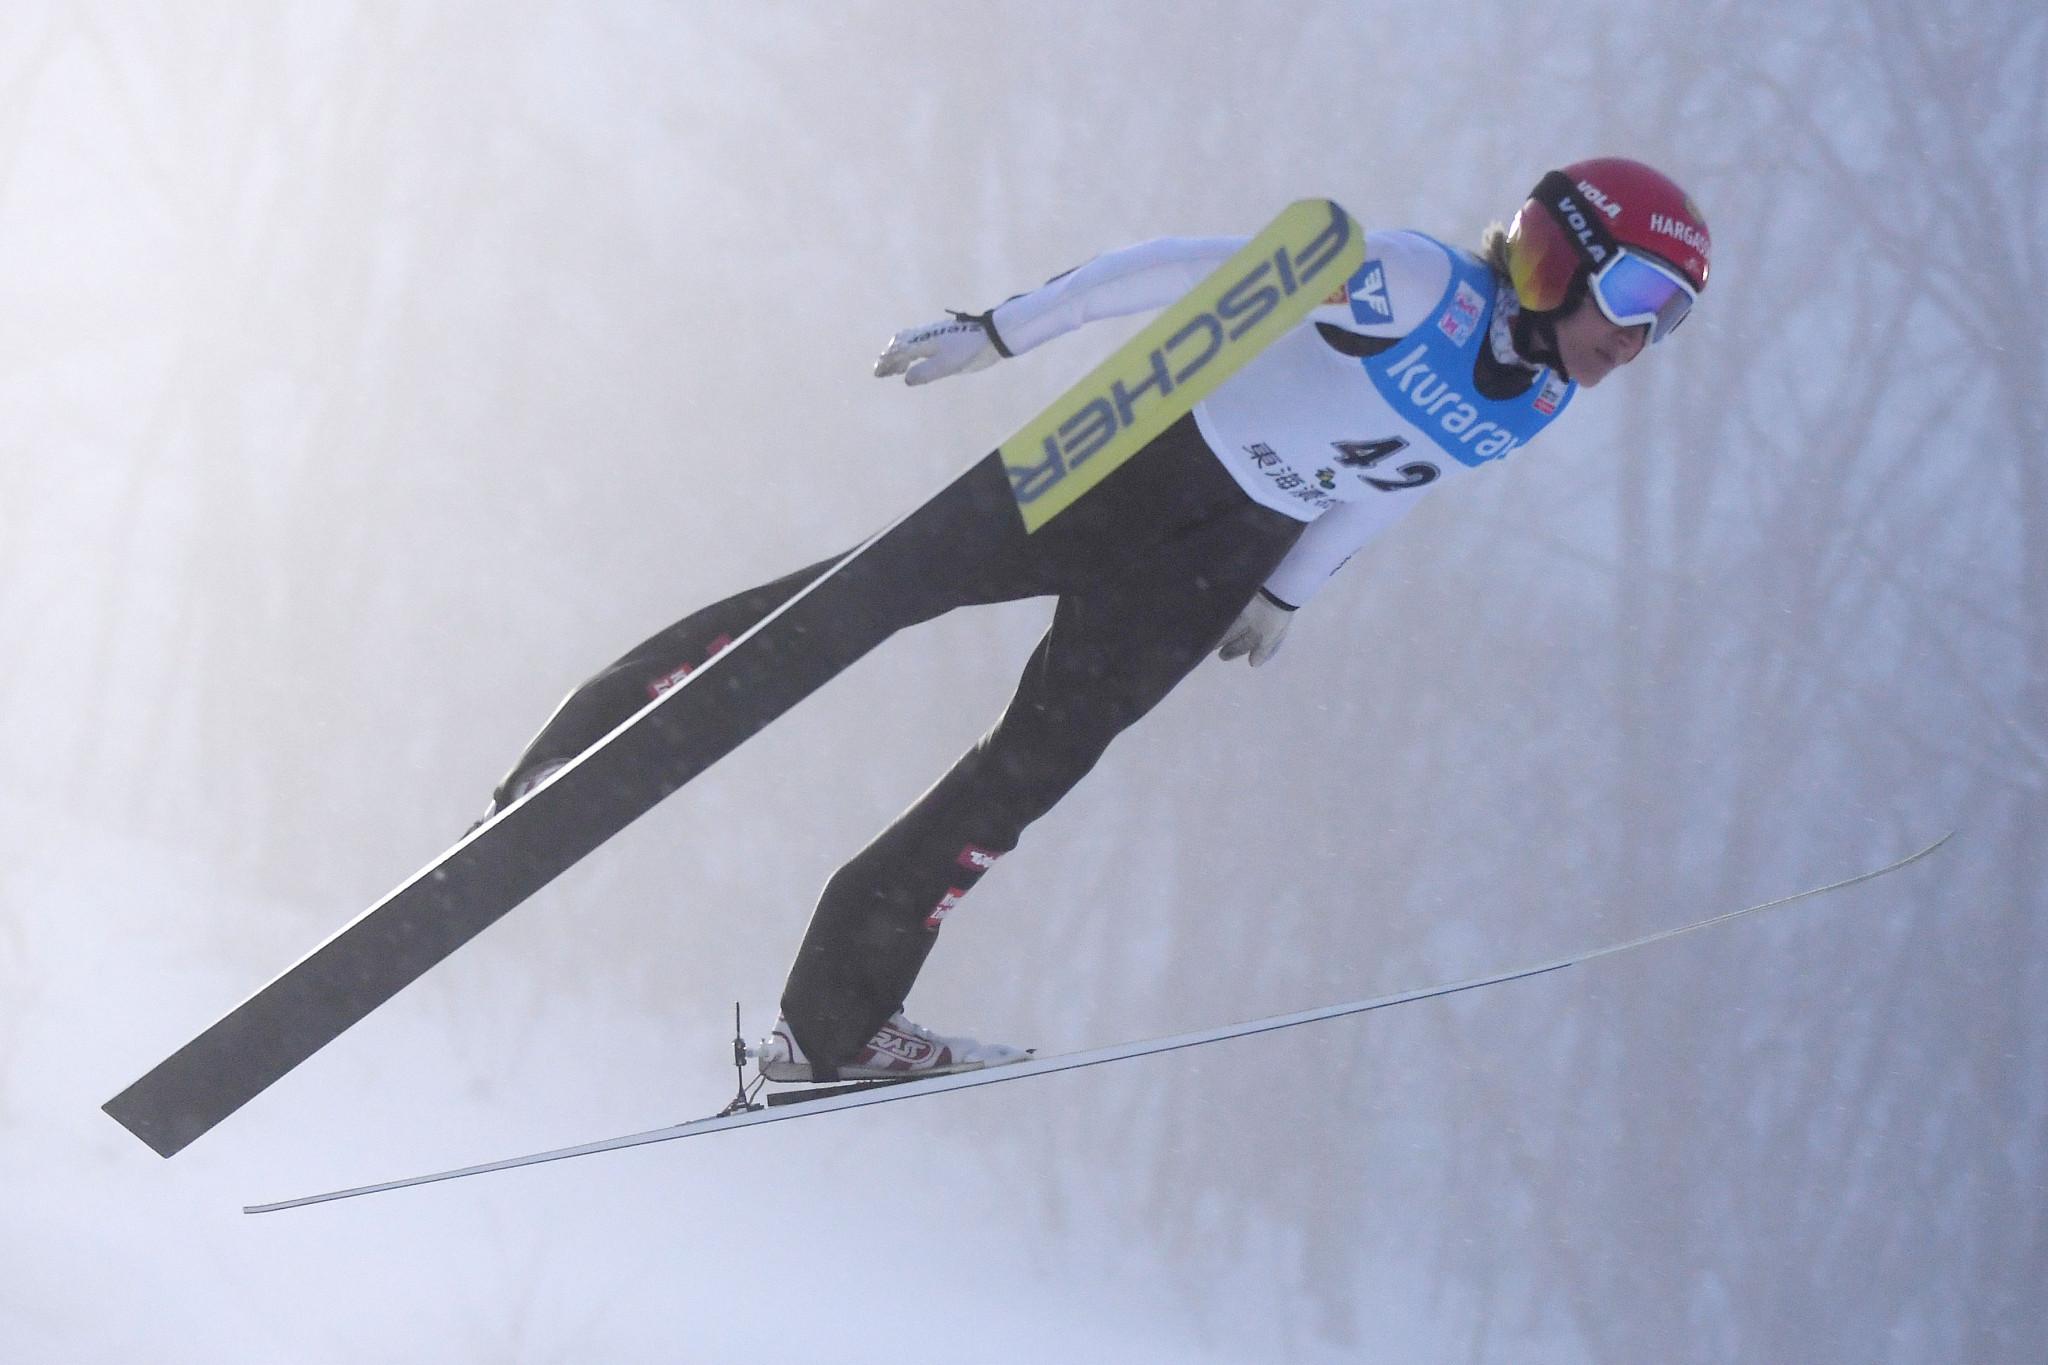 Austria's 2011 world champion Daniela Iraschko-Stolz came third ©Getty Images